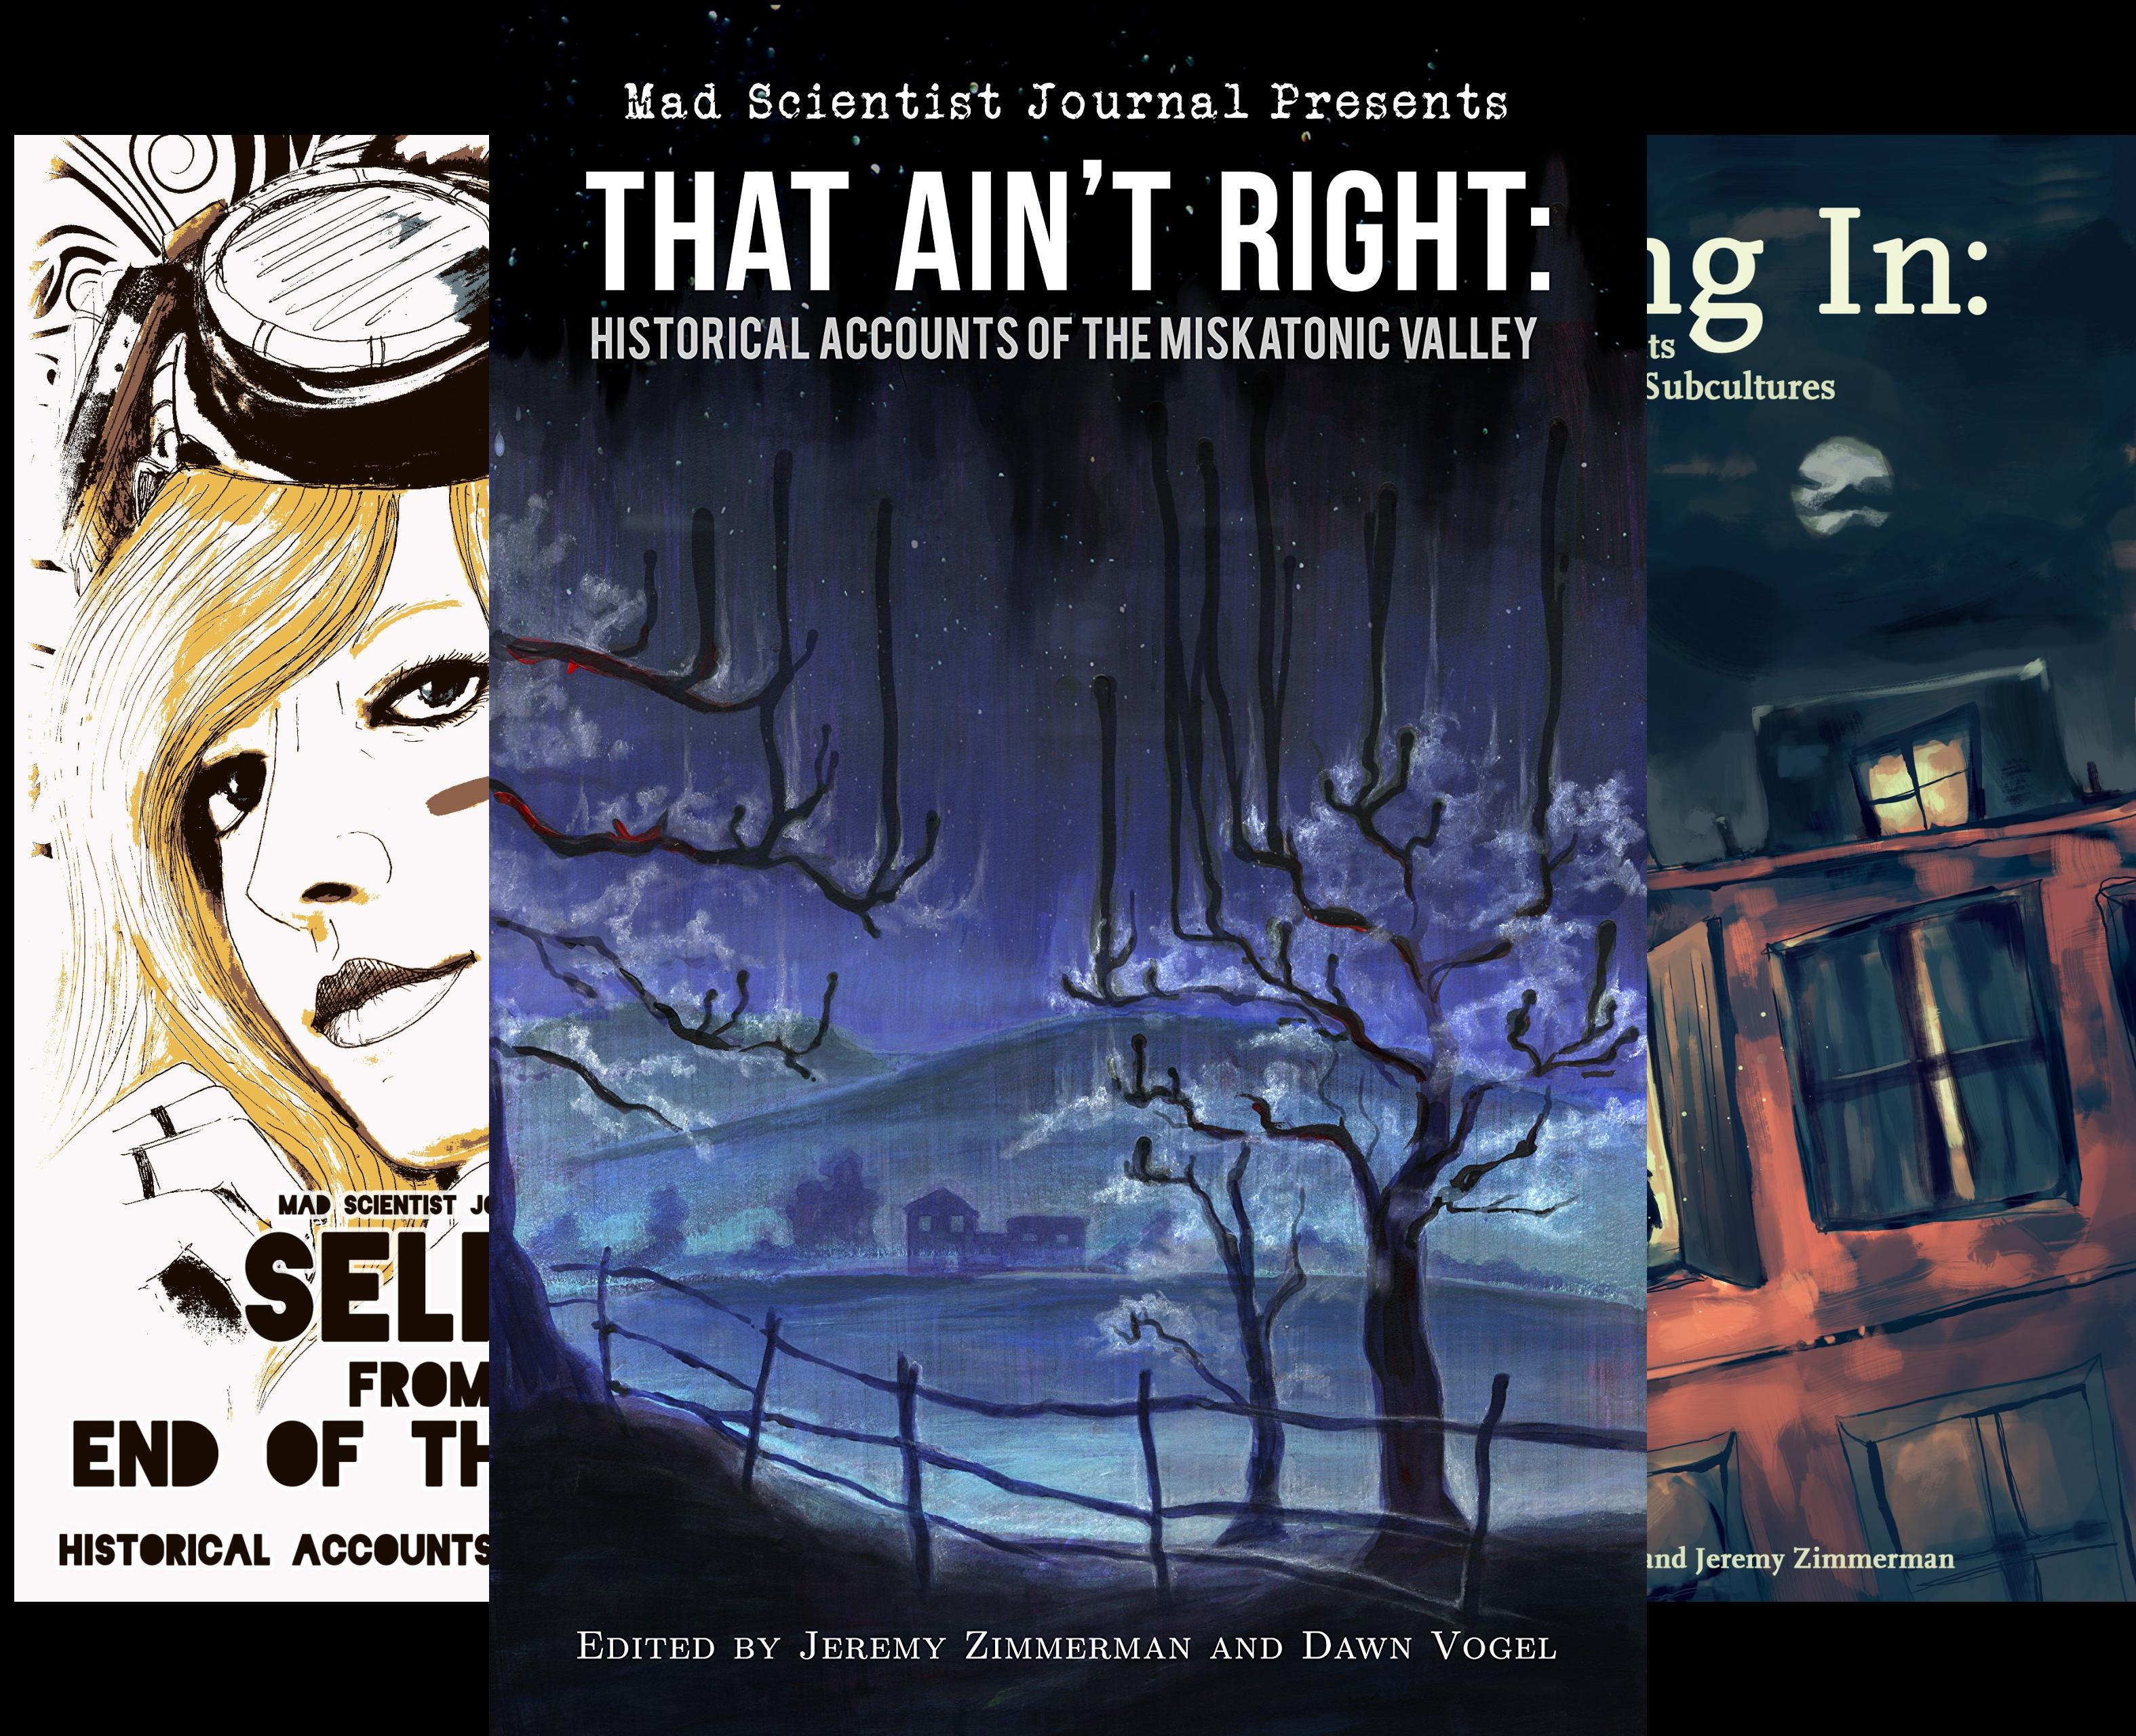 Mad Scientist Journal Presents (4 Book Series)